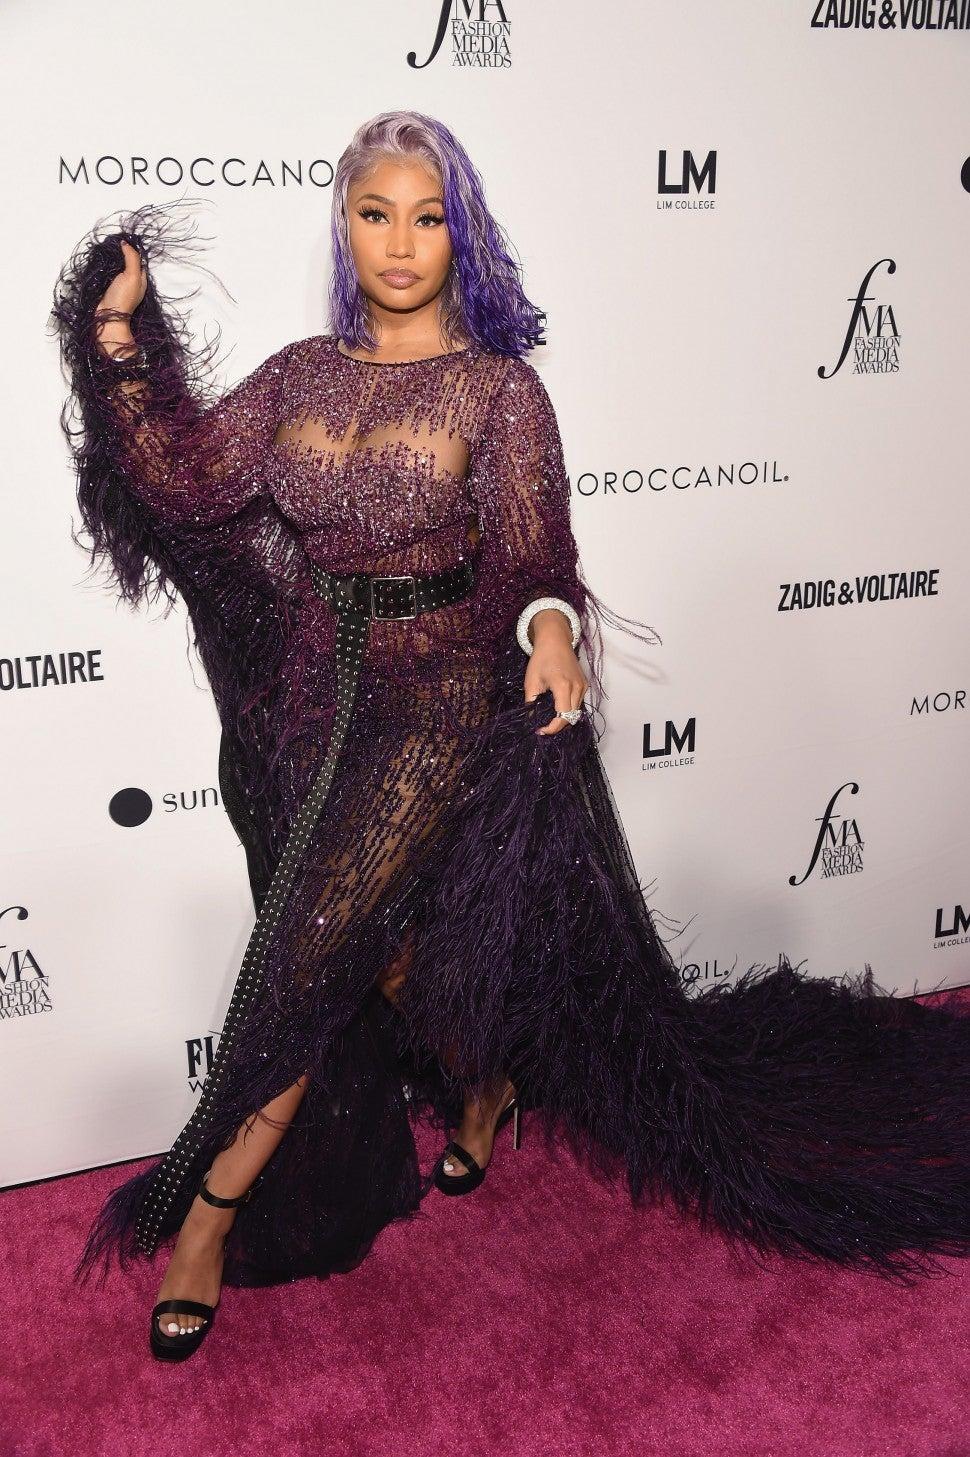 Kash Doll Reveals She Unfollowed Nicki Minaj on Instagram